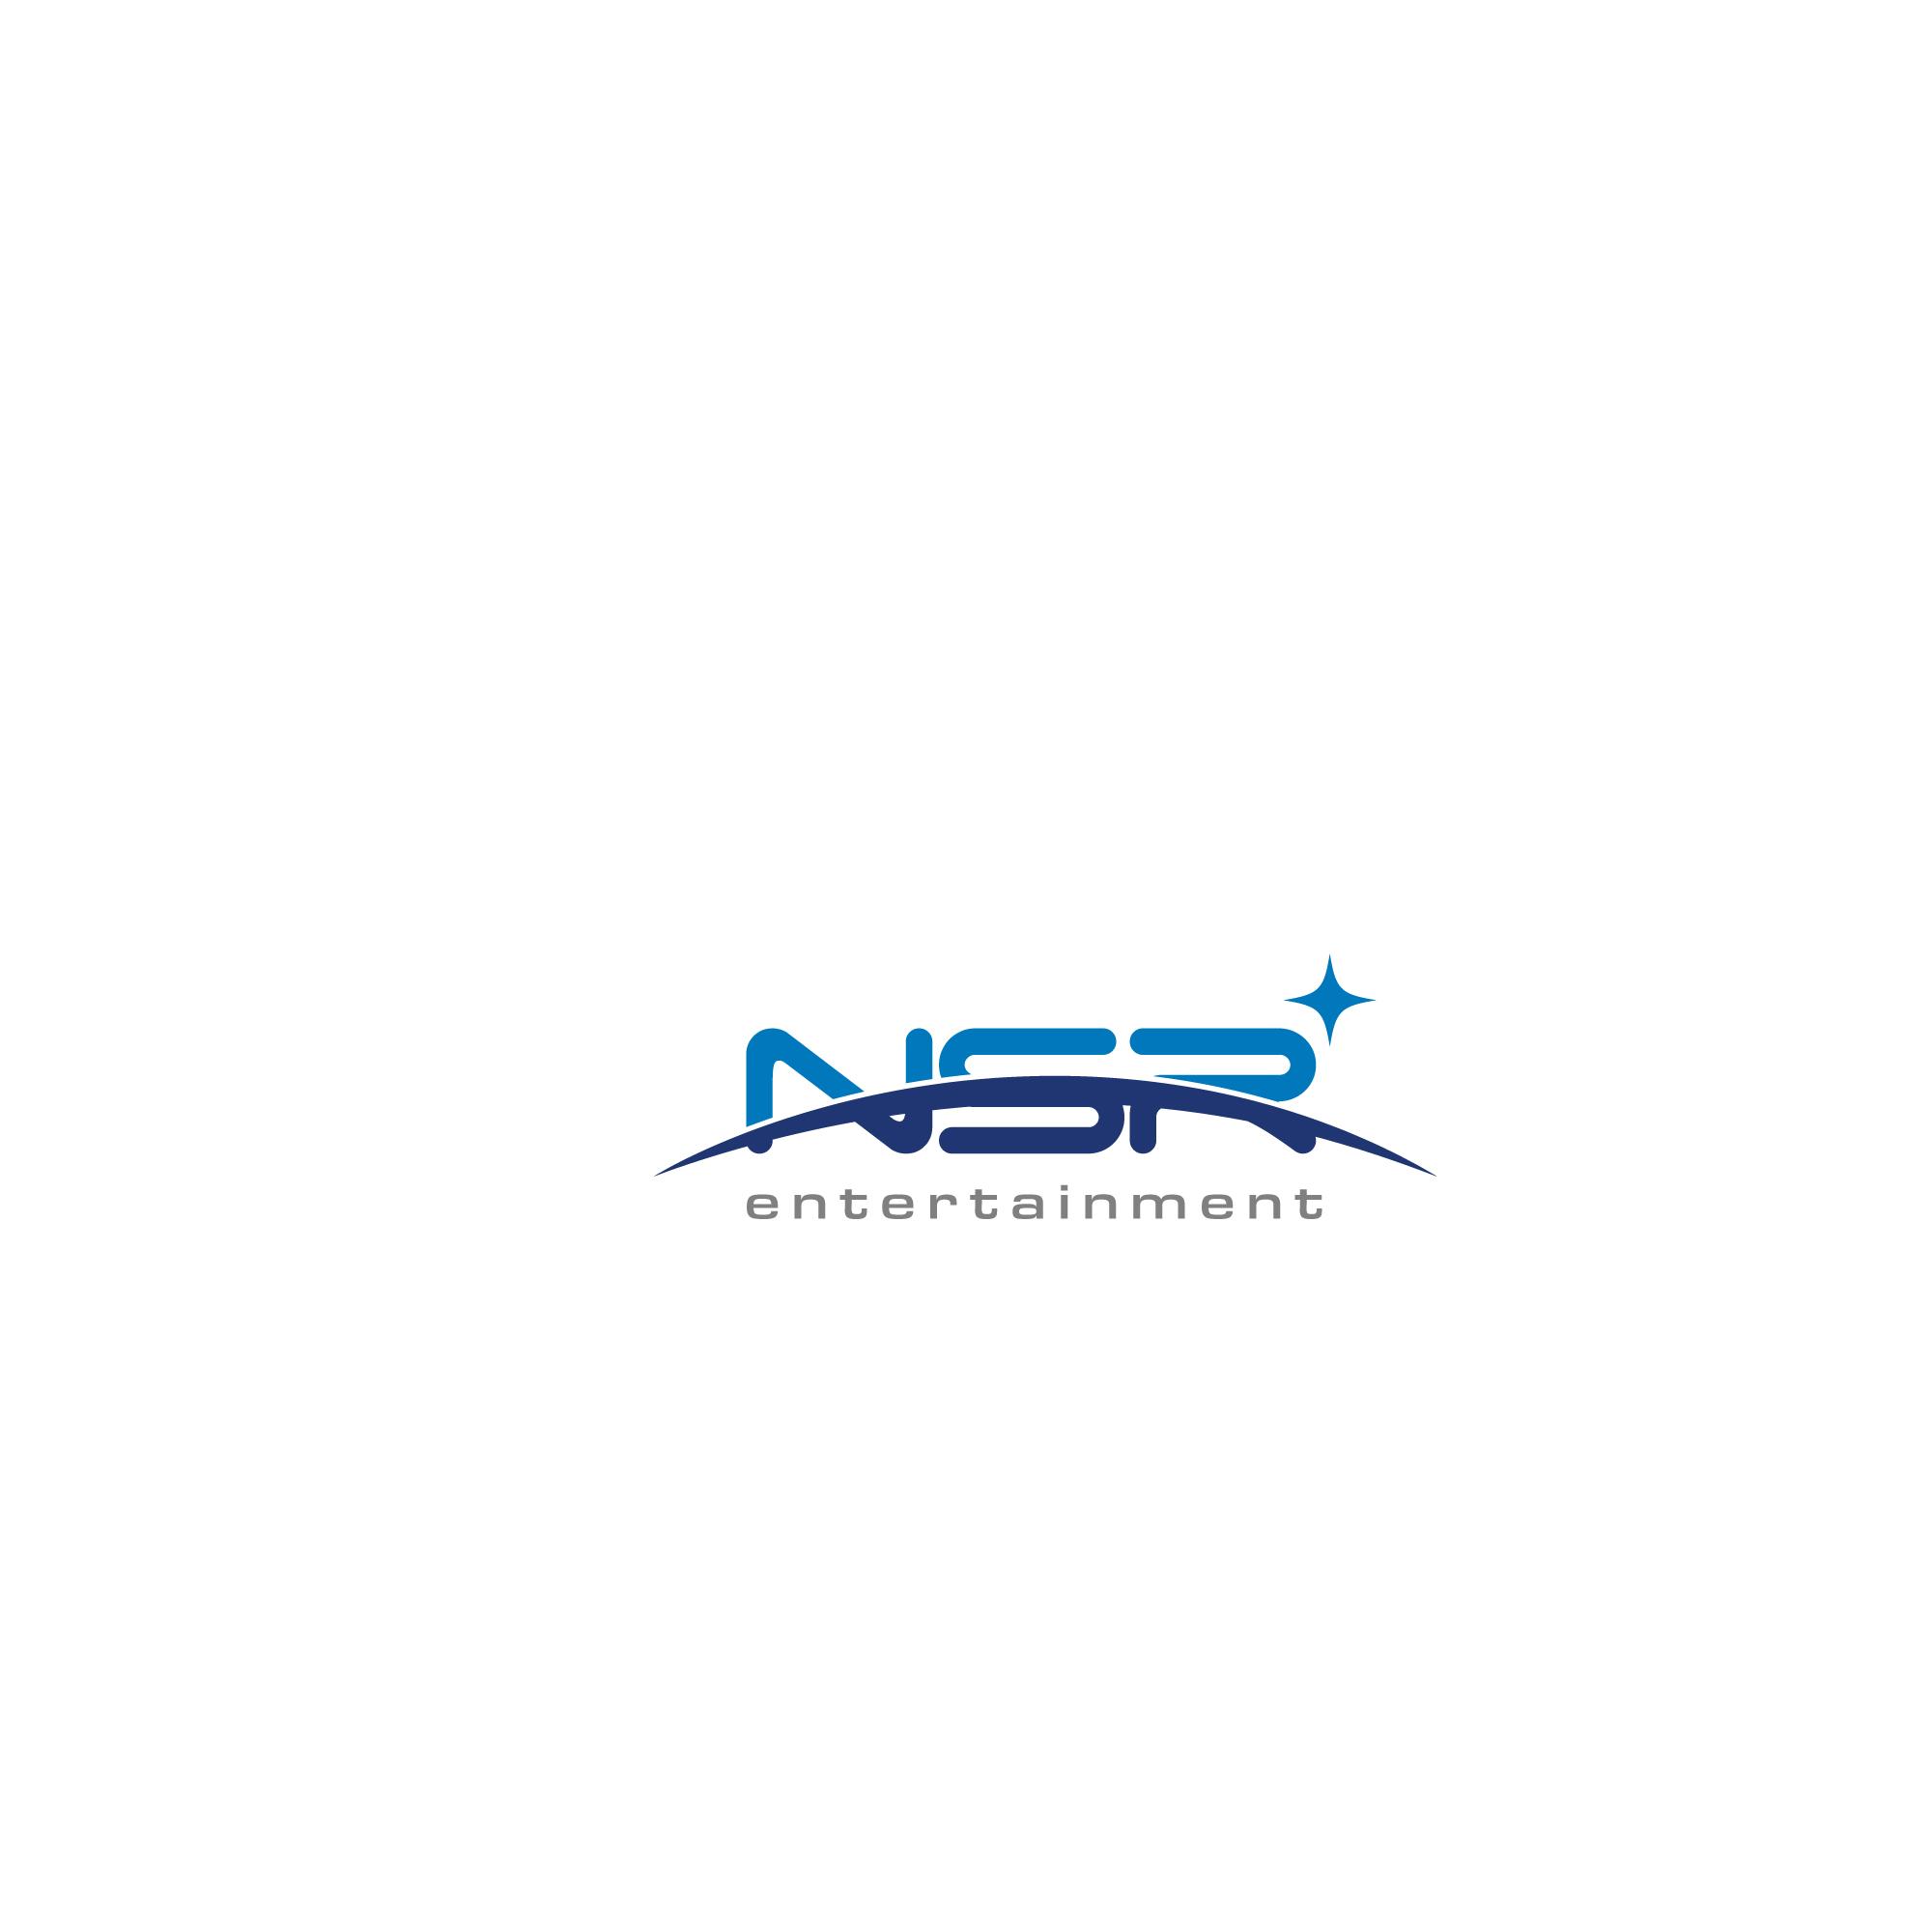 Создать логотип фото f_8325c628f721dbef.jpg